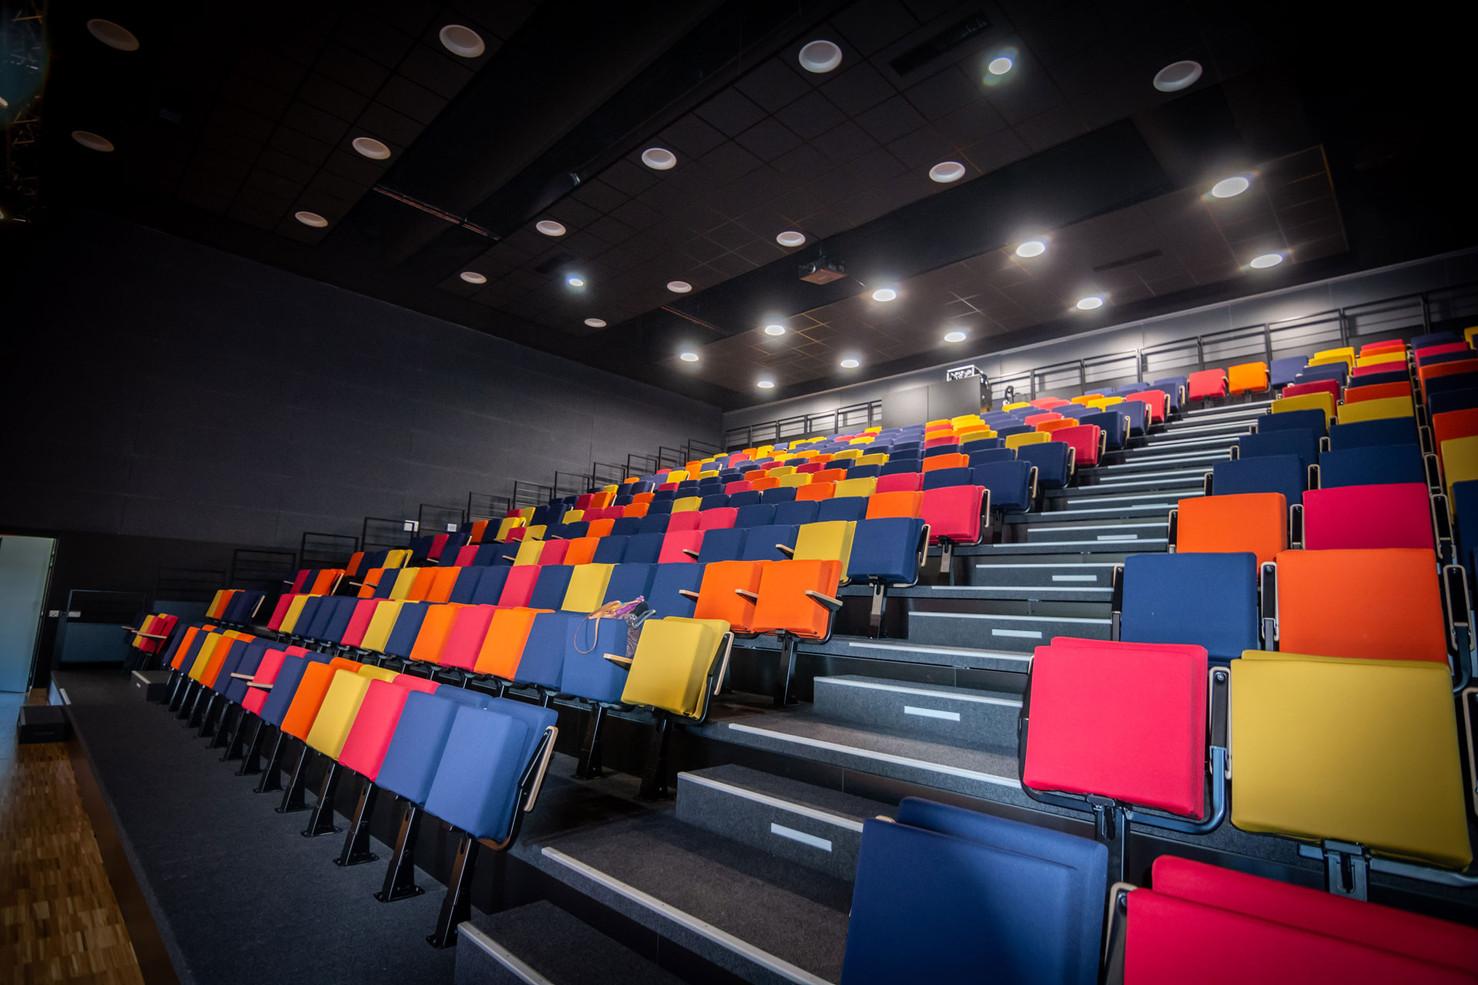 Salle multifonctions - Plouvorn